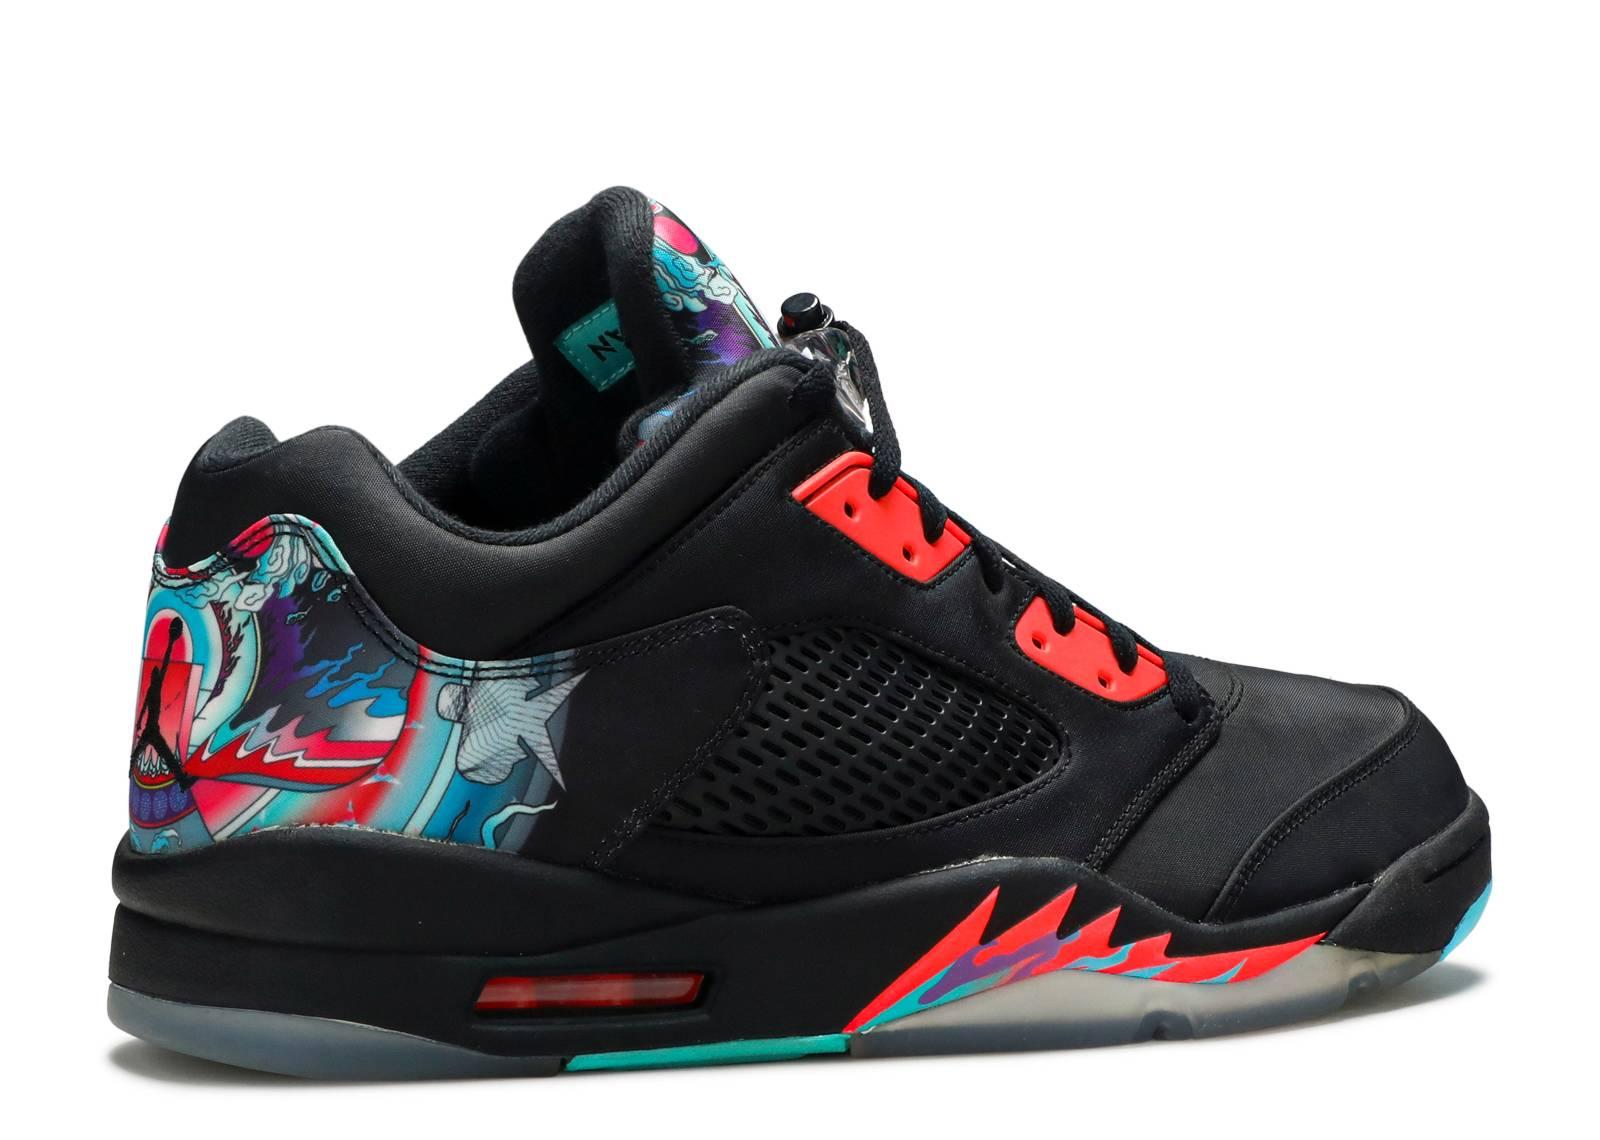 Air Jordan 5 Retro Low Cny